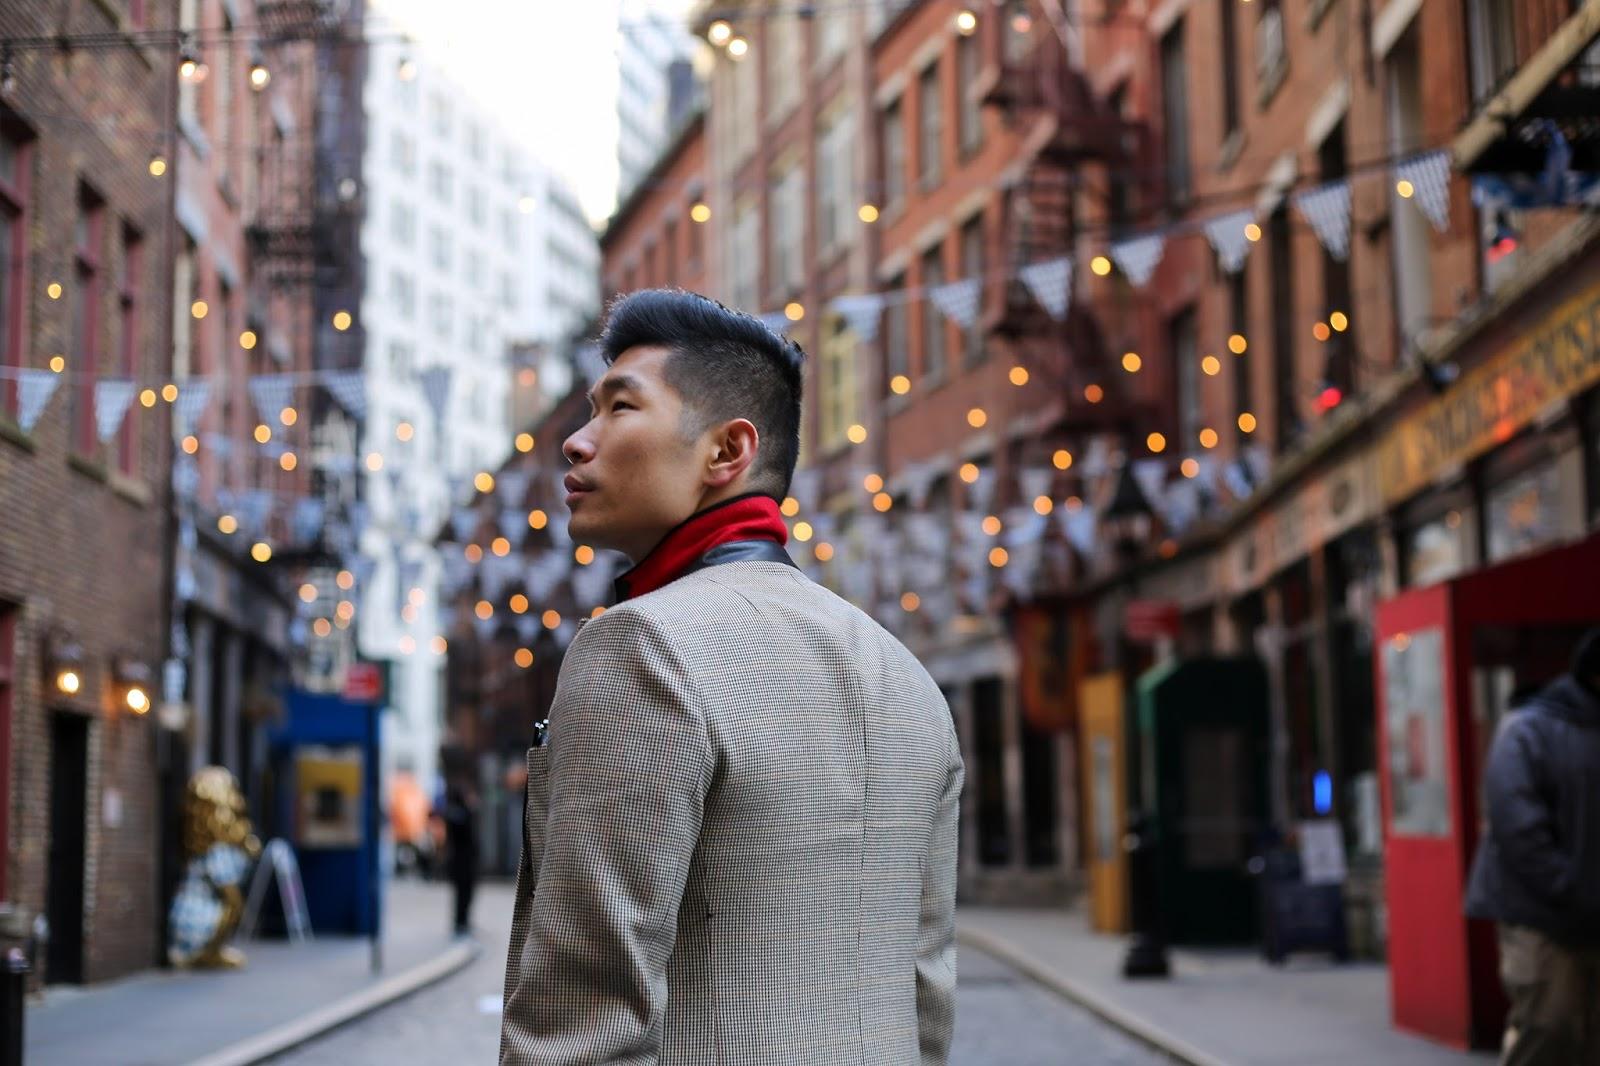 Levitate Style, menswear blogger, wearing Rag & Bone Dagger Topcoat and Striped Sweater